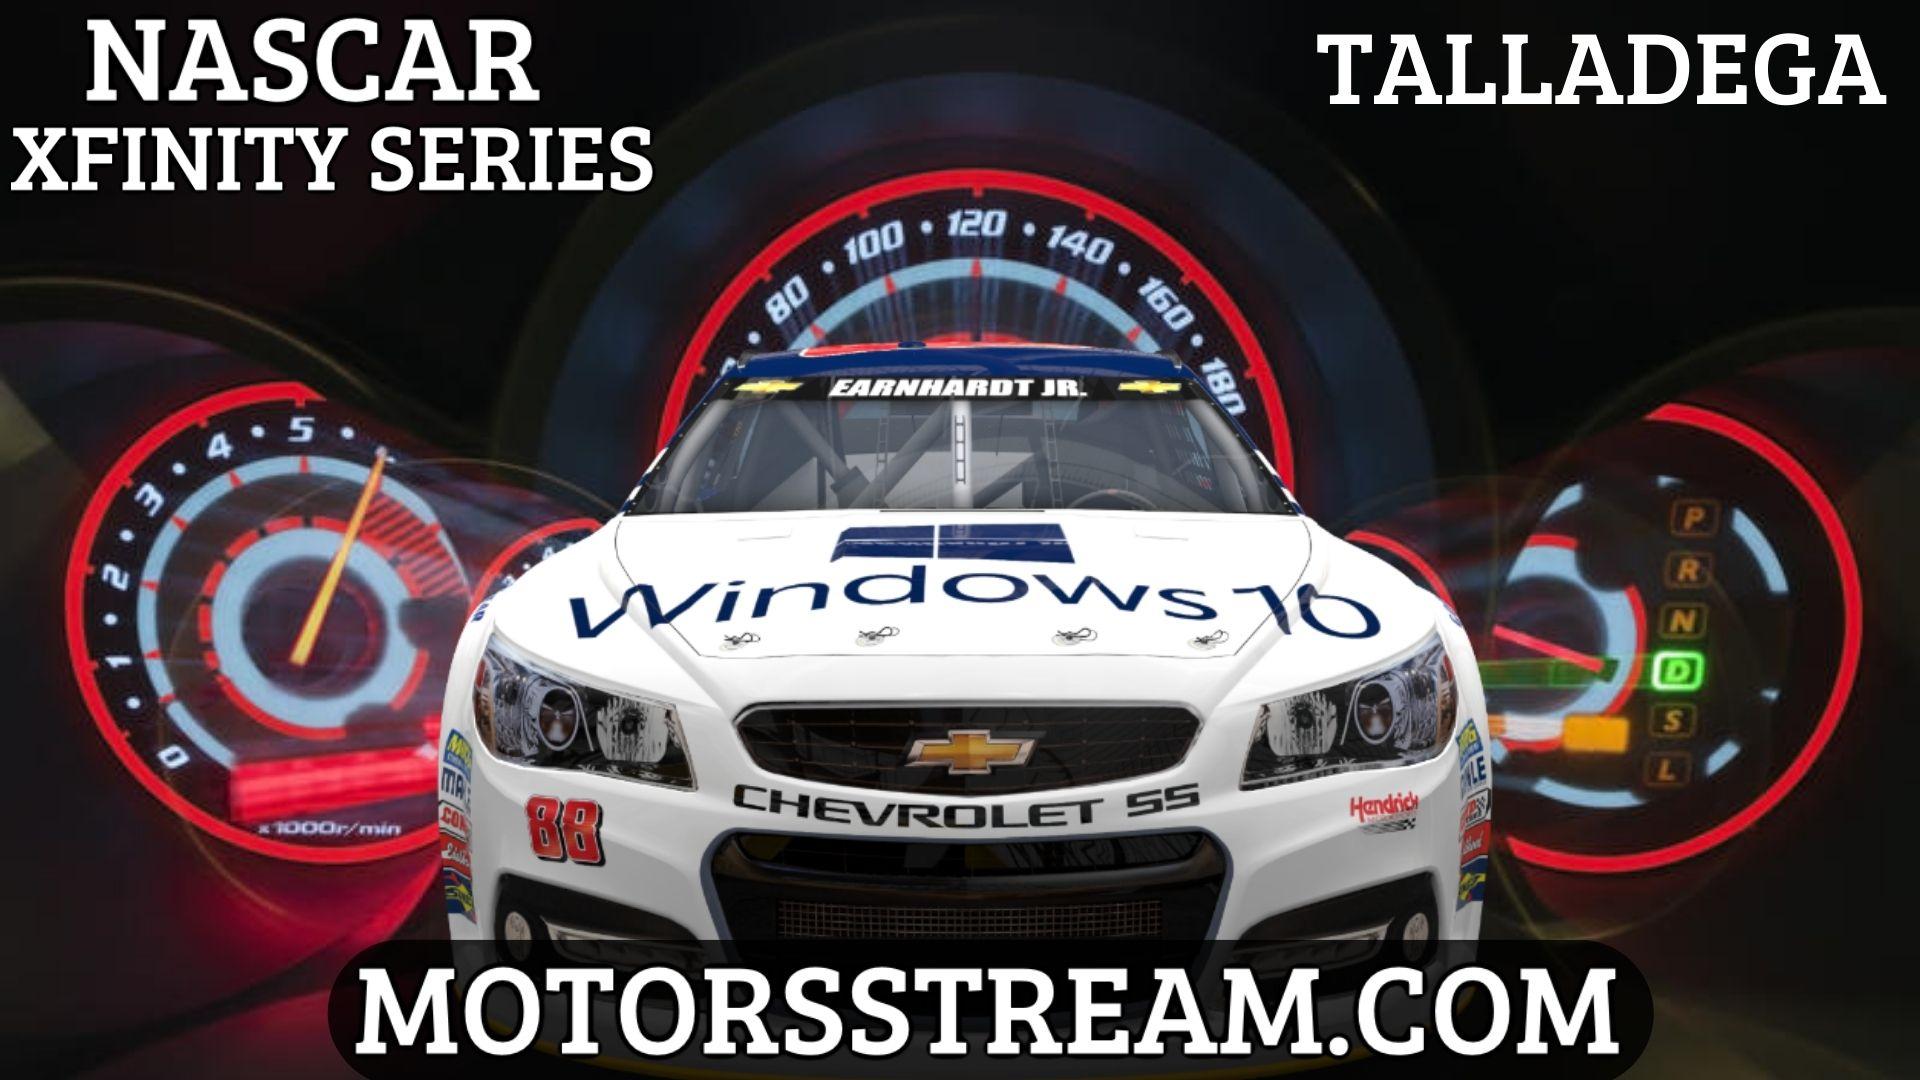 NASCAR Xfinity Series Talladega Live Stream